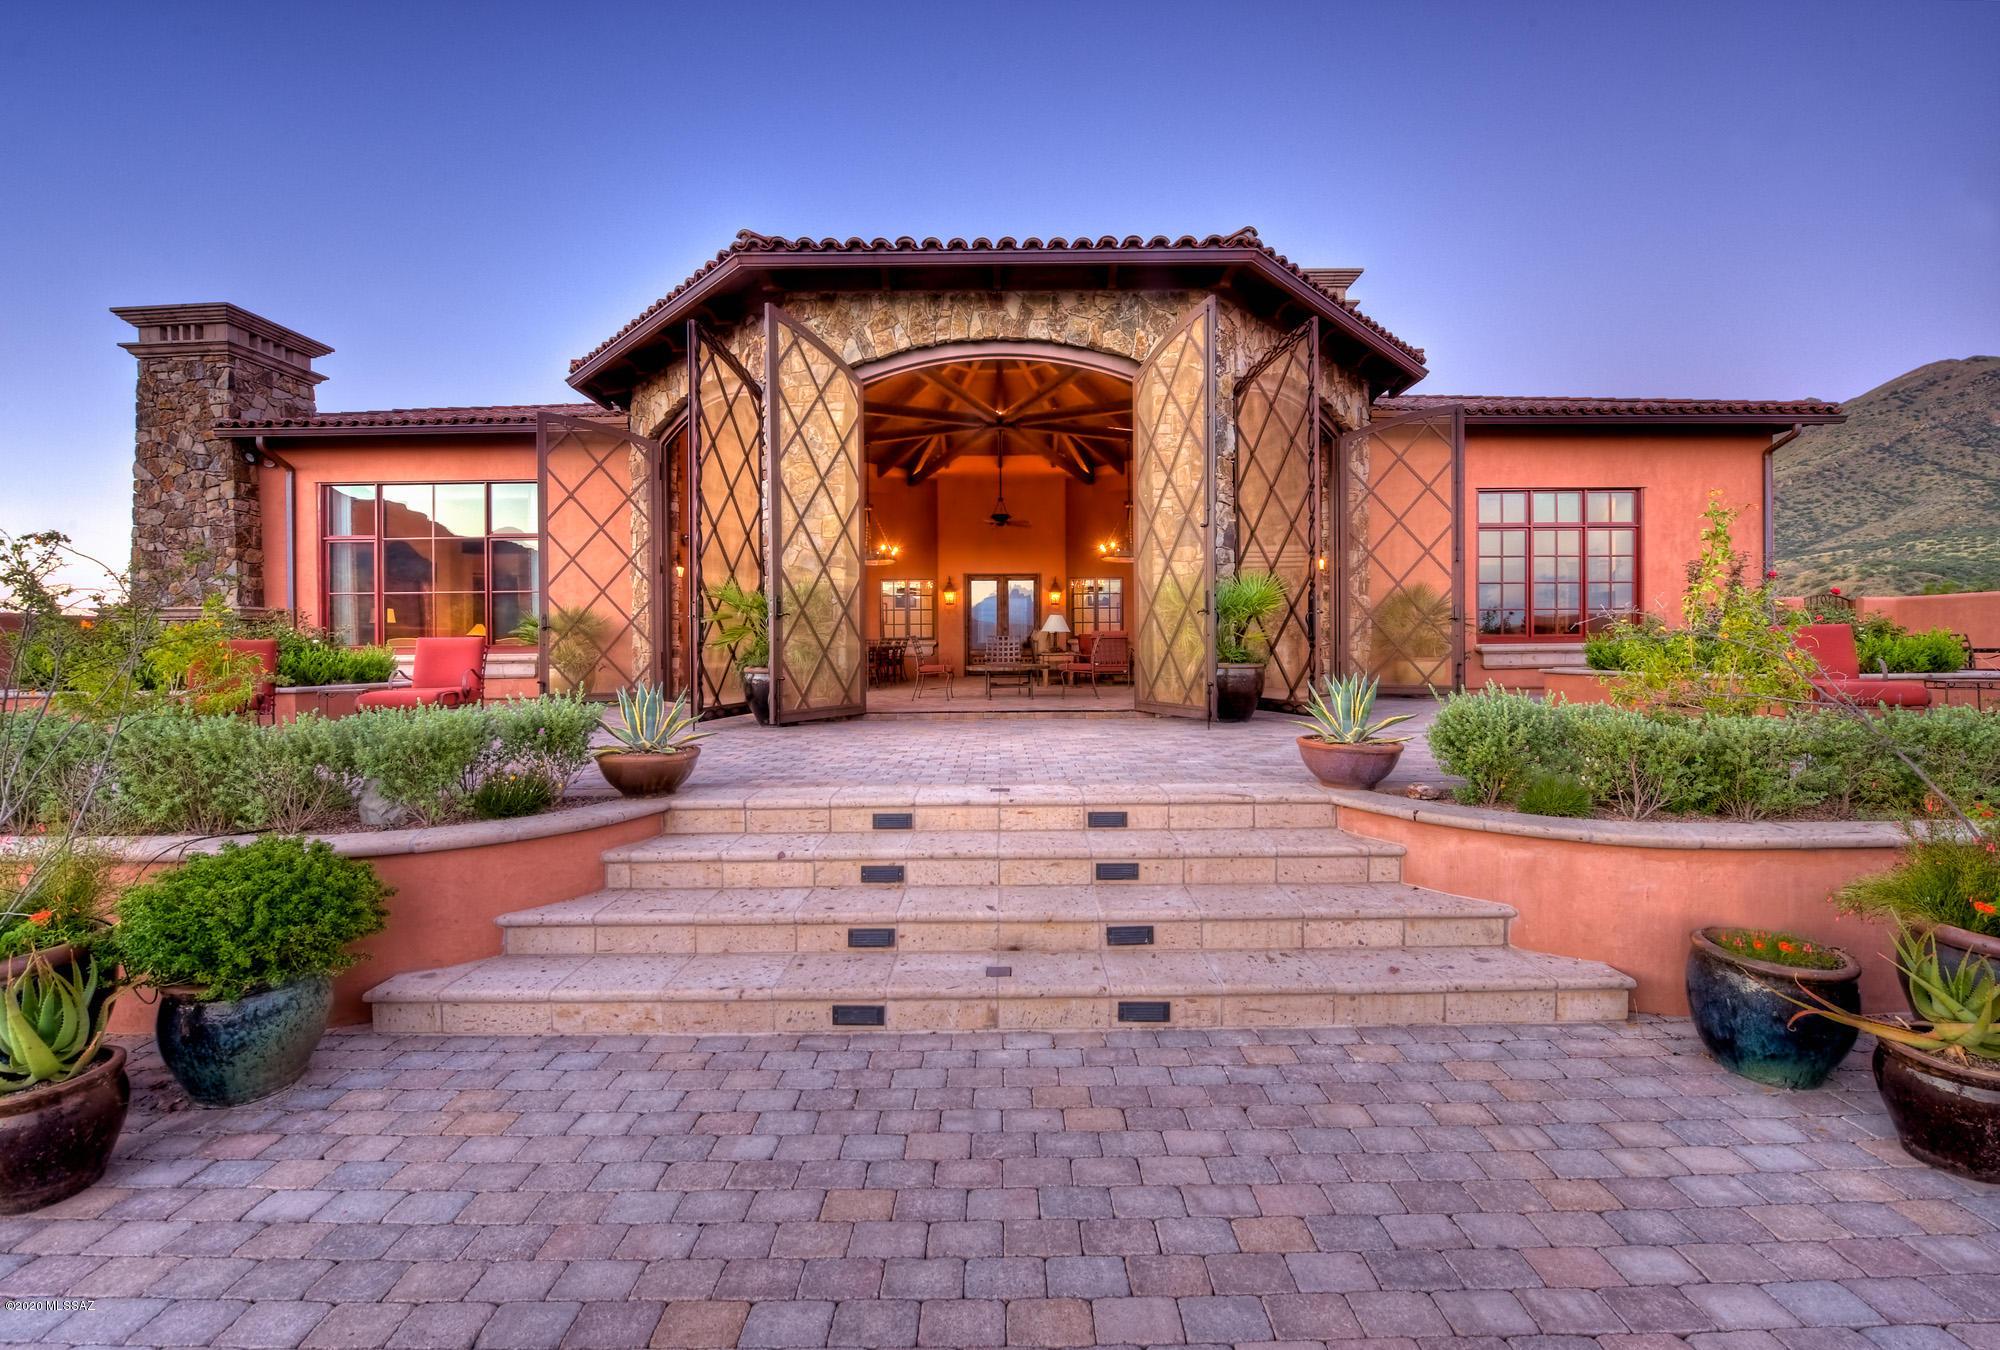 Photo of 1266 Morning Star Drive, Tubac, AZ 85646